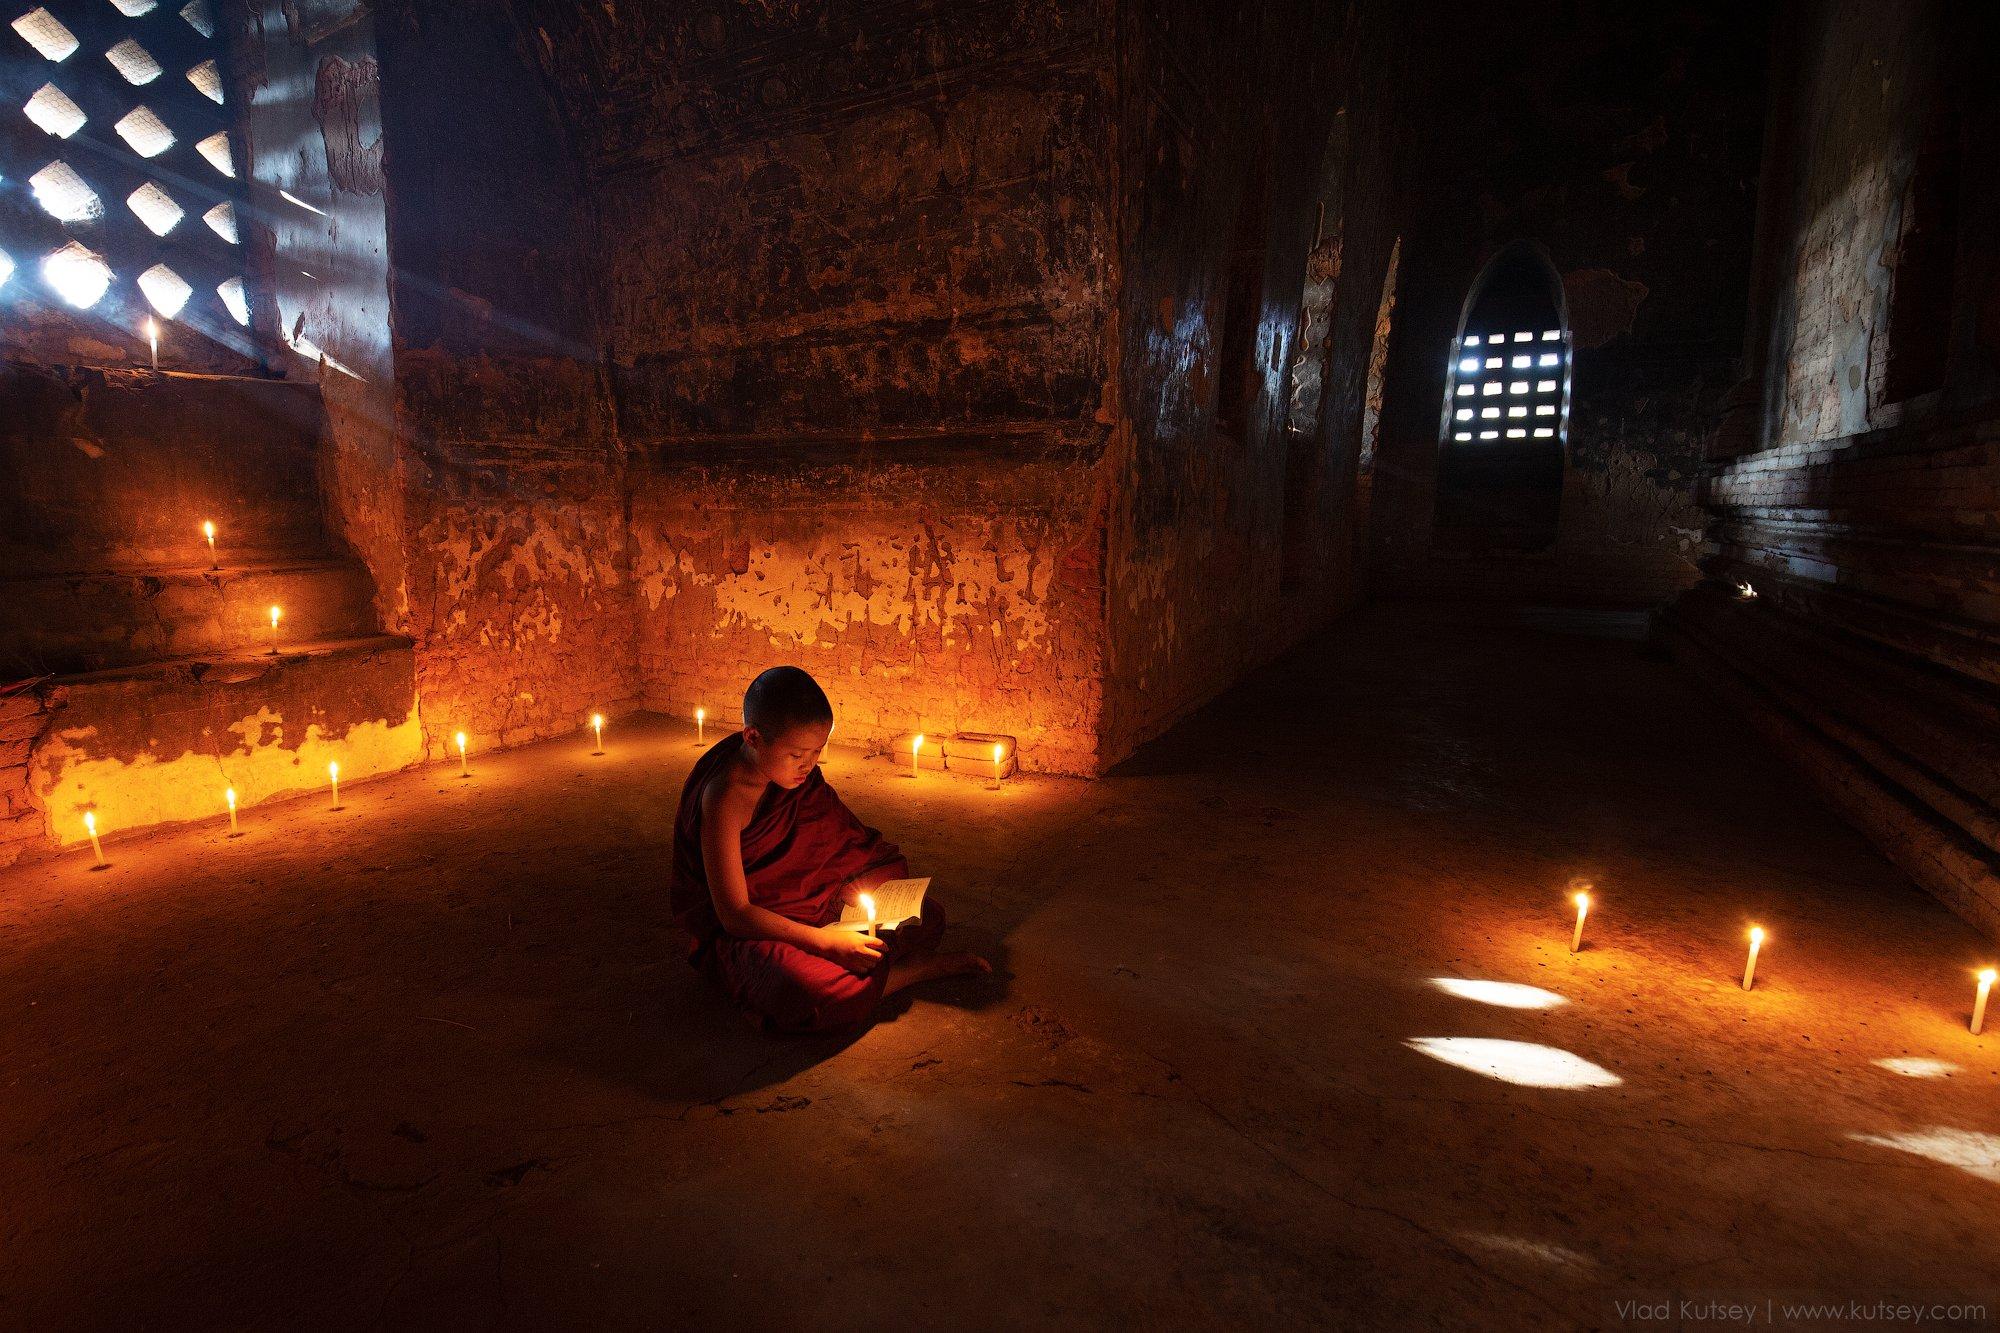 монах, мьянма, бирма, баган, храм, пагода, pagoda, temple, monk, myanmar, burma, Владимир Куцый (Vlad Kutsey)